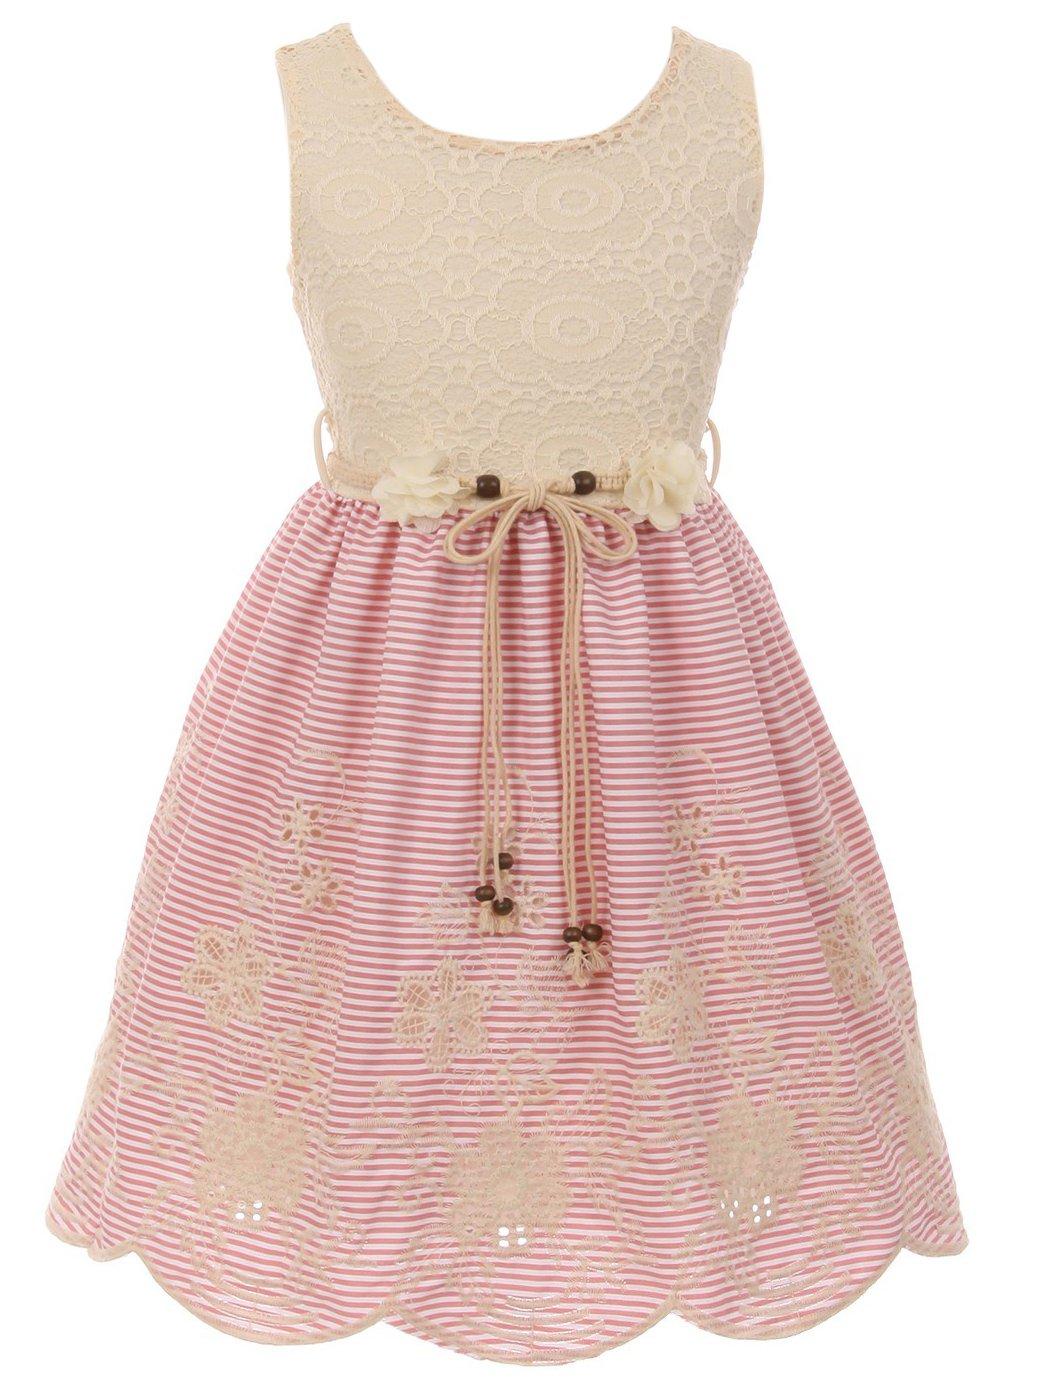 BluNight Collection Big Girls Elegant Round Neck Lace Cotton Summer Birthday Party Flower Girl Dress Pink 12 (2J1K35S)